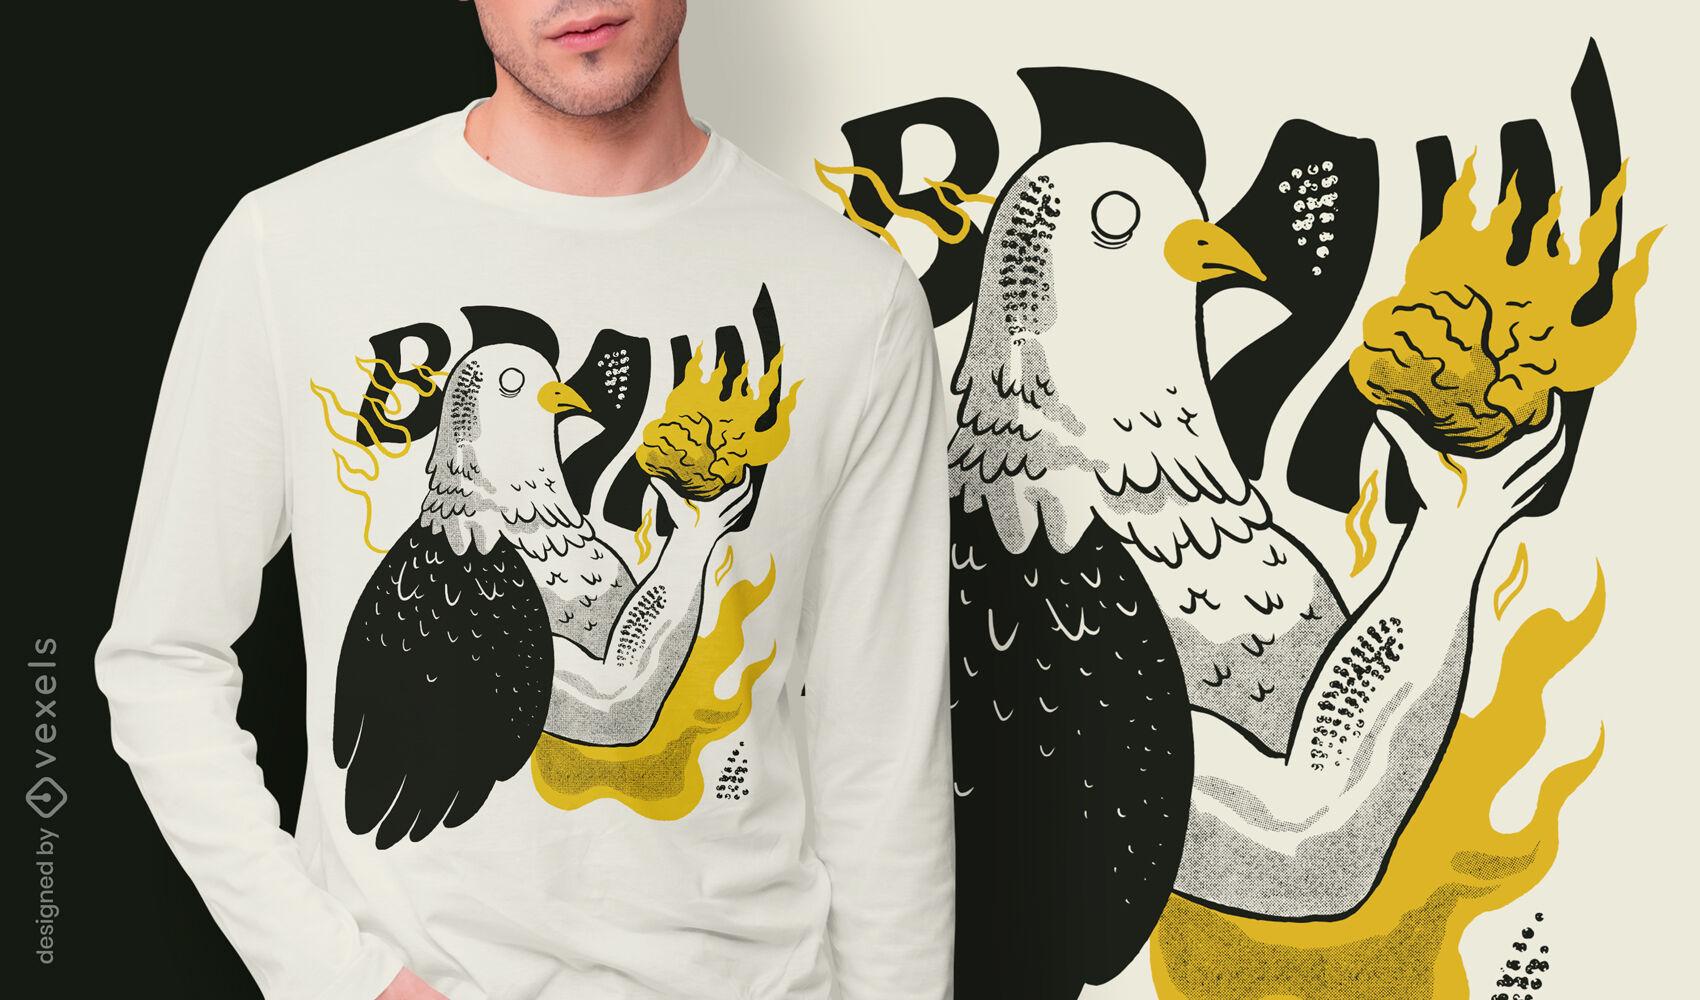 Bizarre pidgeon bird body t-shirt design